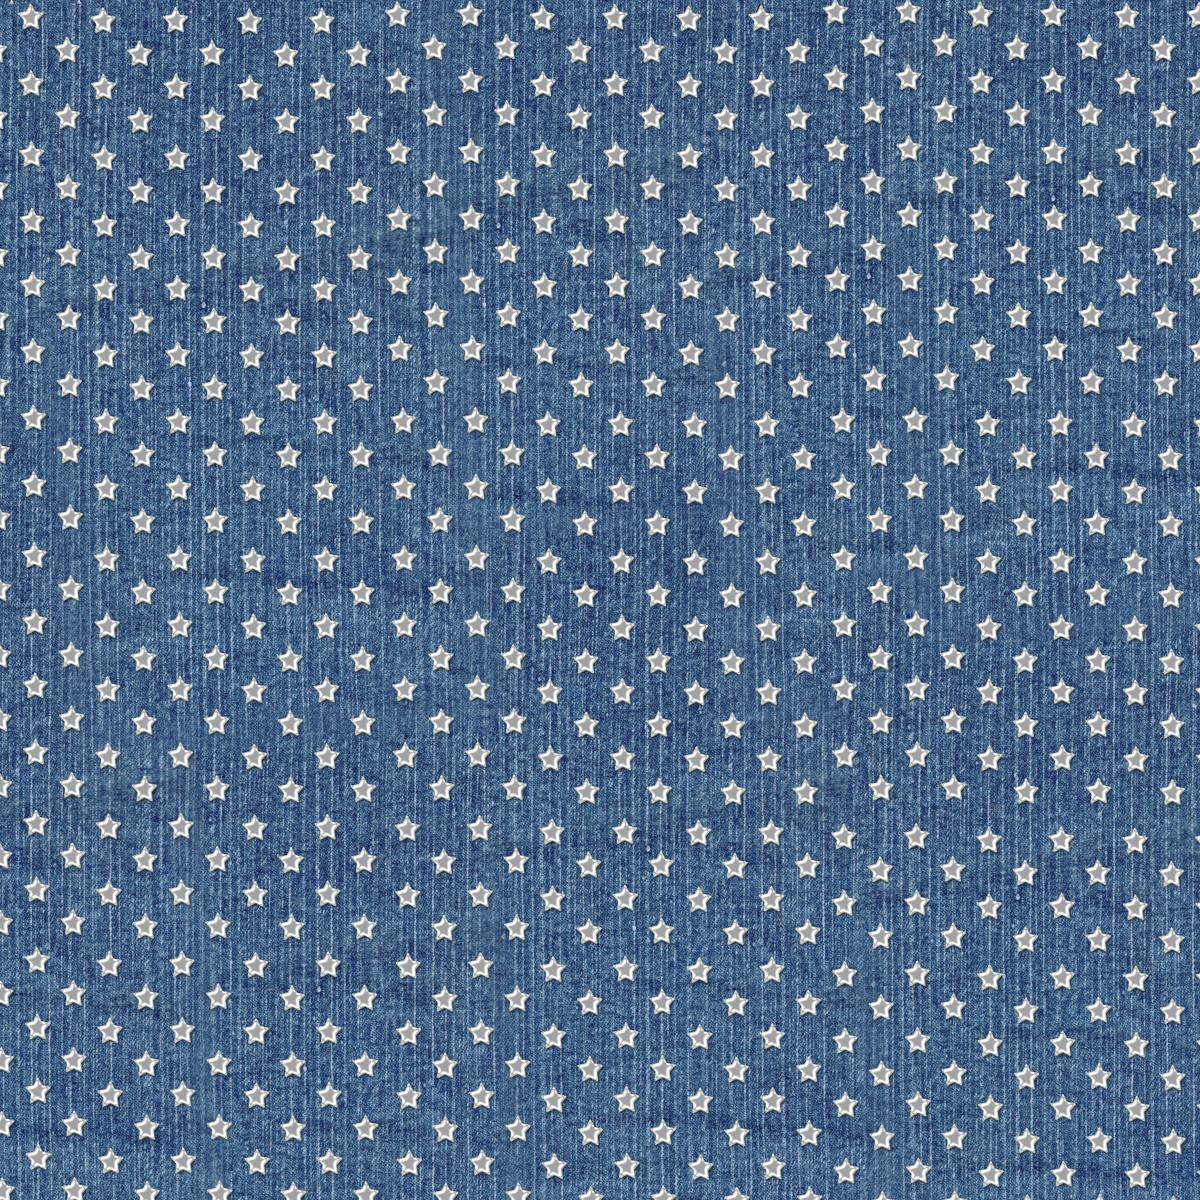 GRANNY ENCHANTED'S BLOG: Free Denim Buttons Digi Scrapbook Paper Pack